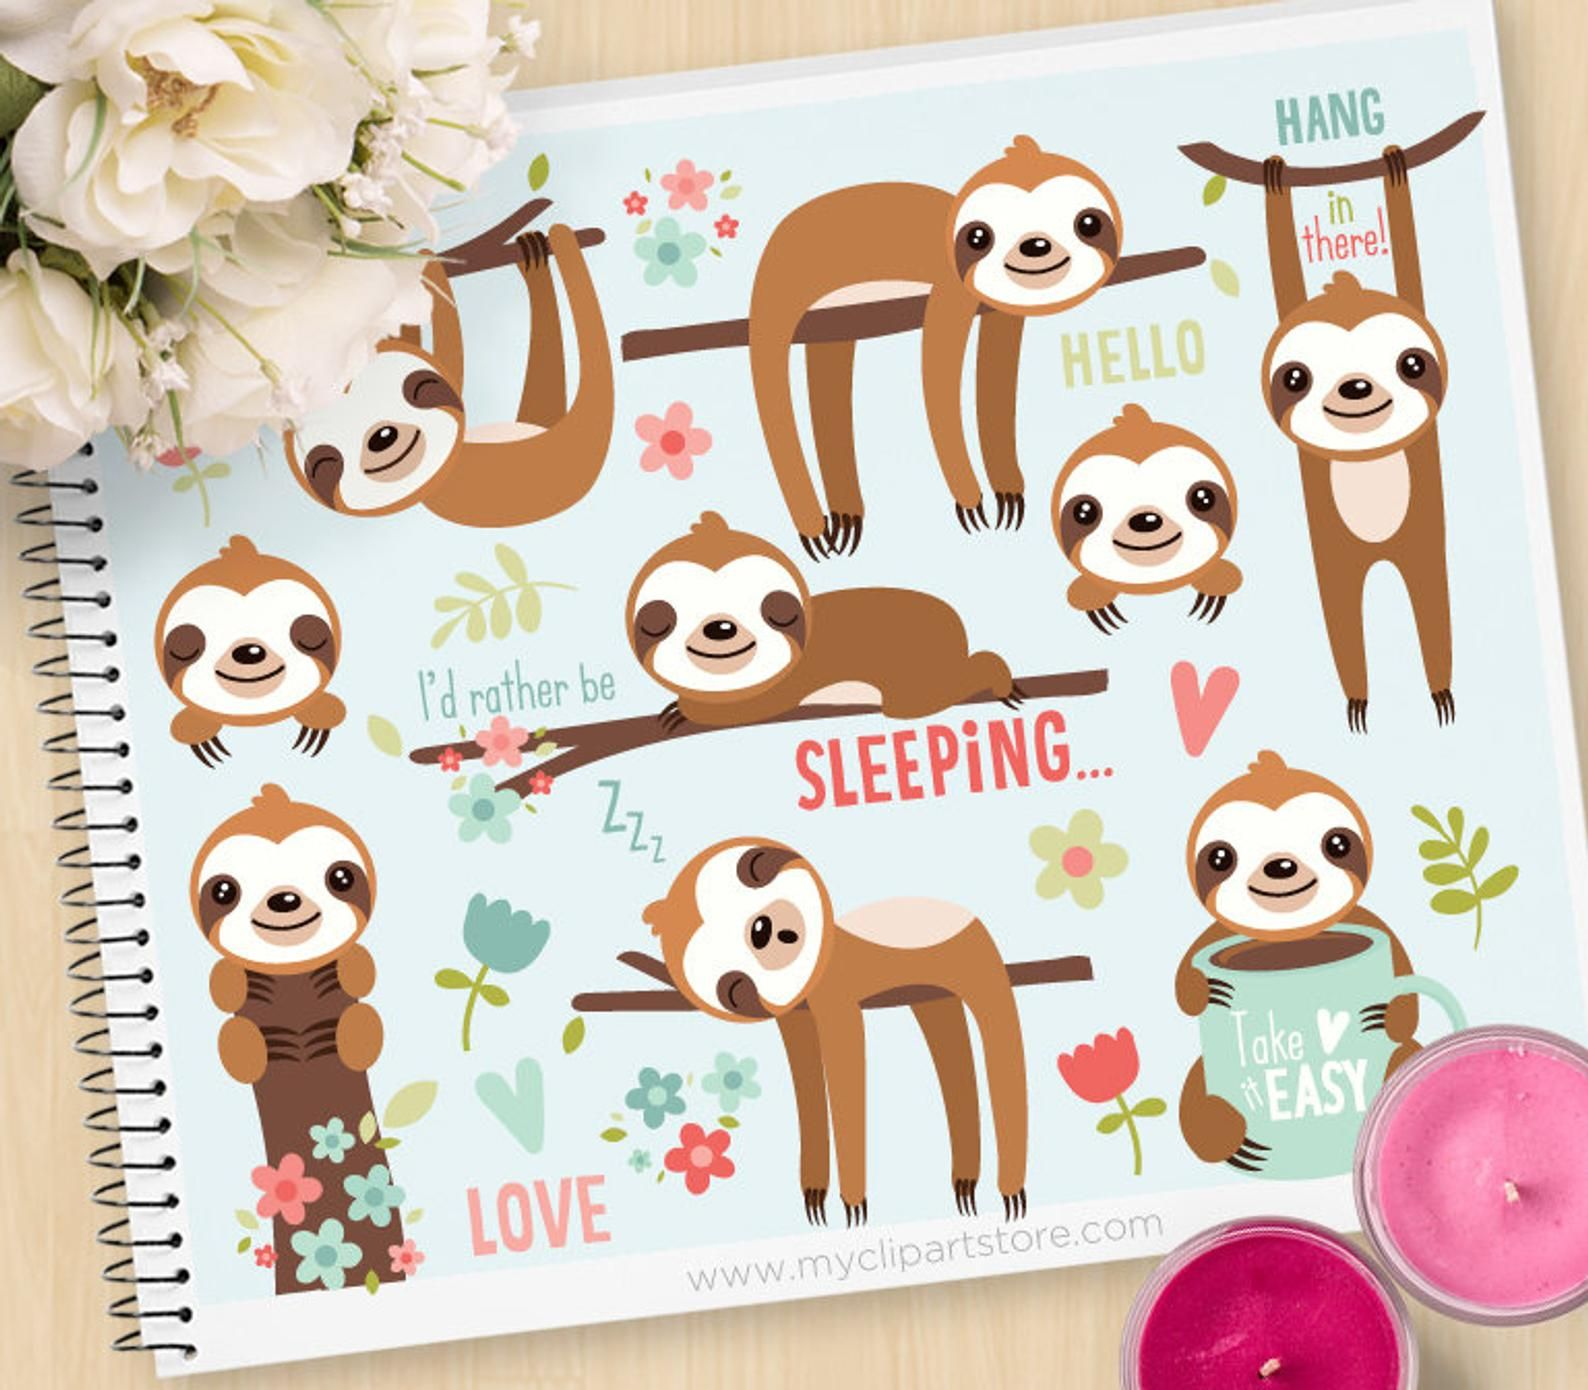 Cute Sloths Clipart, Sleeping, sloth, tree branch, spring